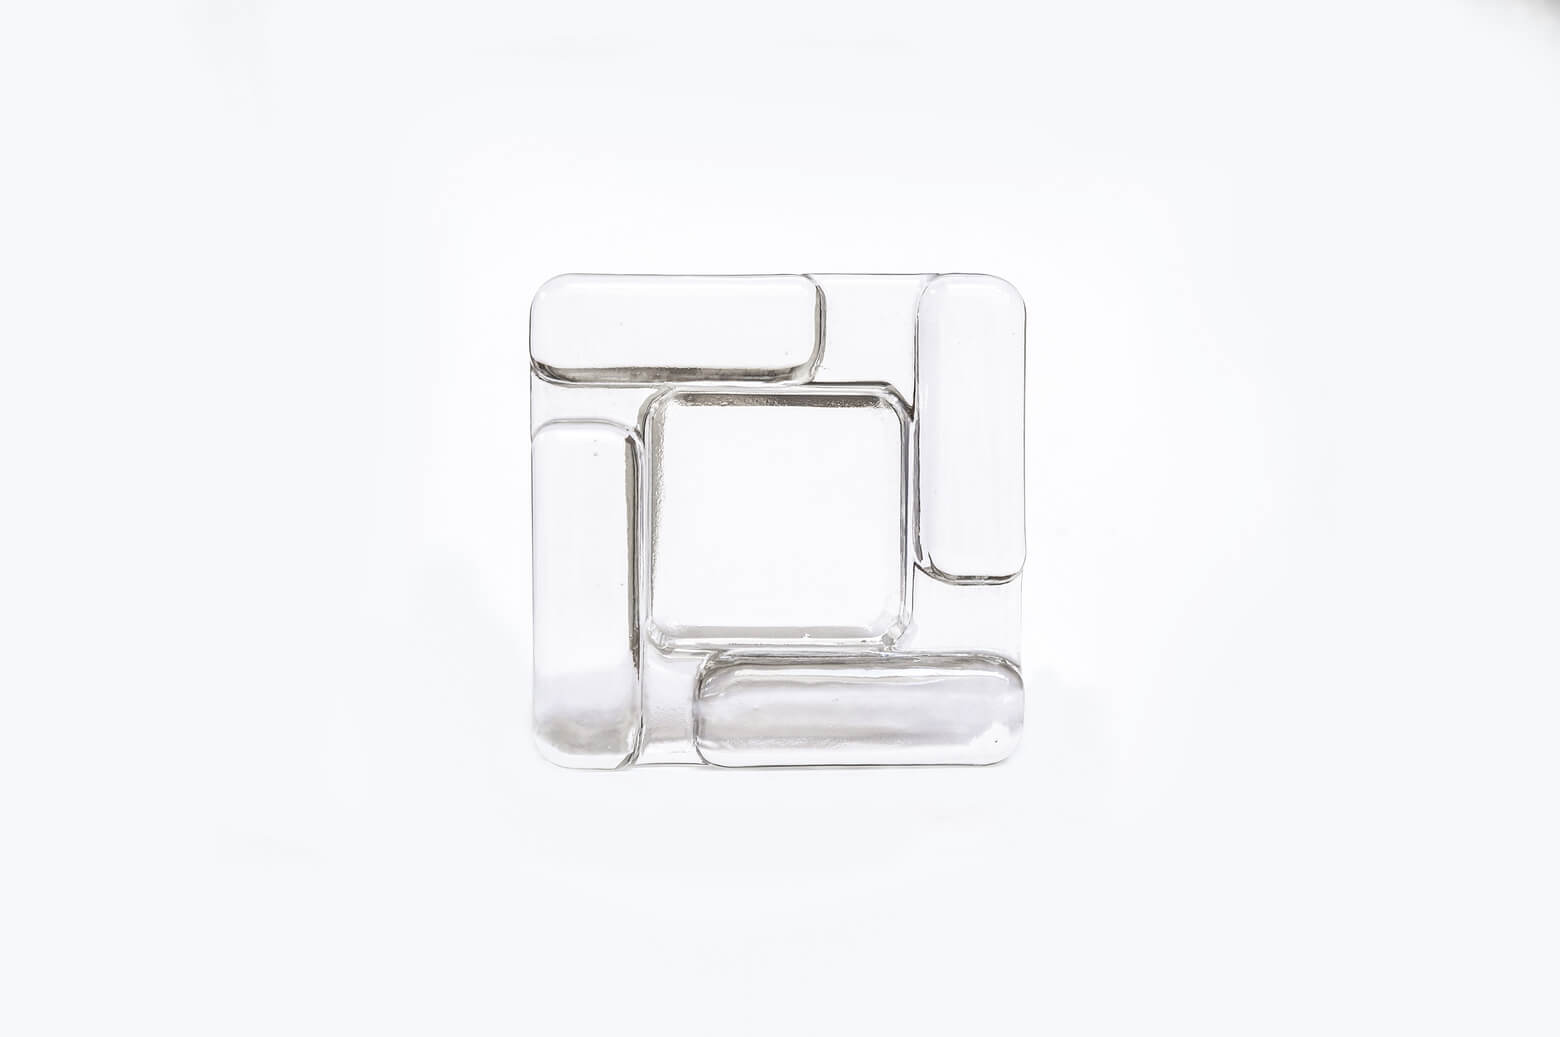 Scandinavian Style Glass Ash Tray/ガラス アッシュトレイ 北欧スタイル インテリア雑貨